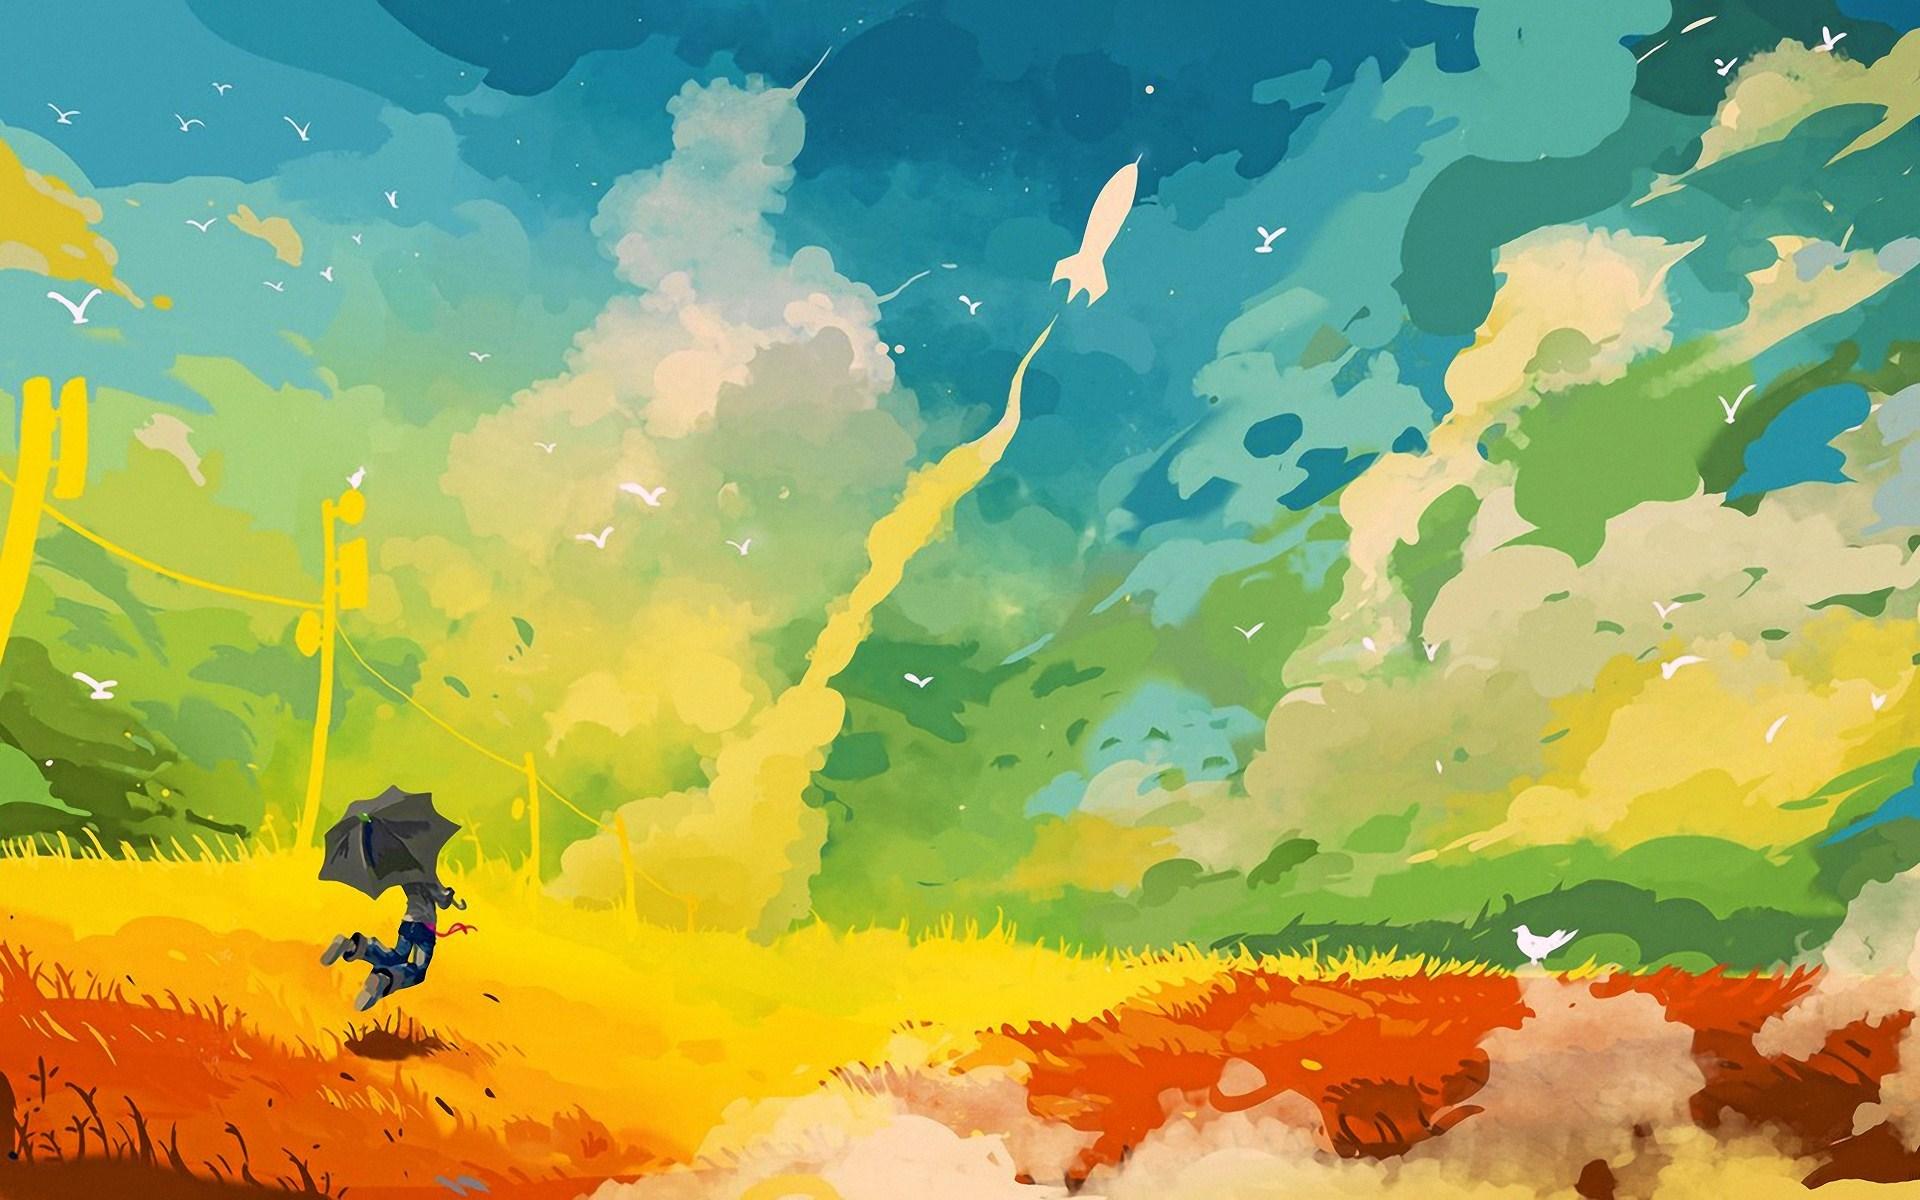 https://www.uplooder.net/img/image/98/d141e5cd0f5a39a0f864efd31abafbbb/art-background-11.jpg